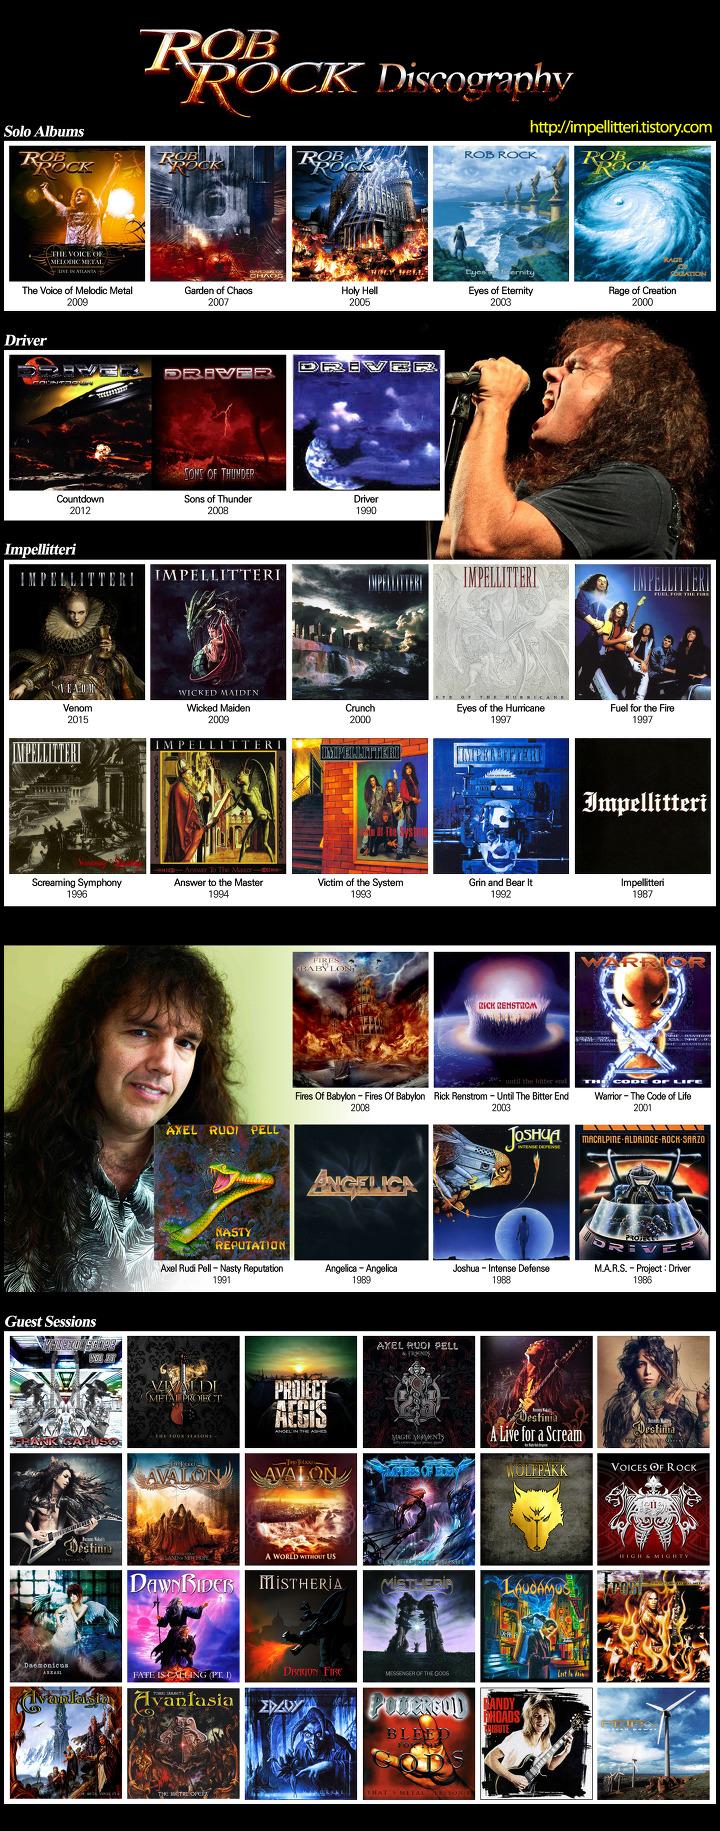 Rob Rock Discography (롭 락 디스코그라피)